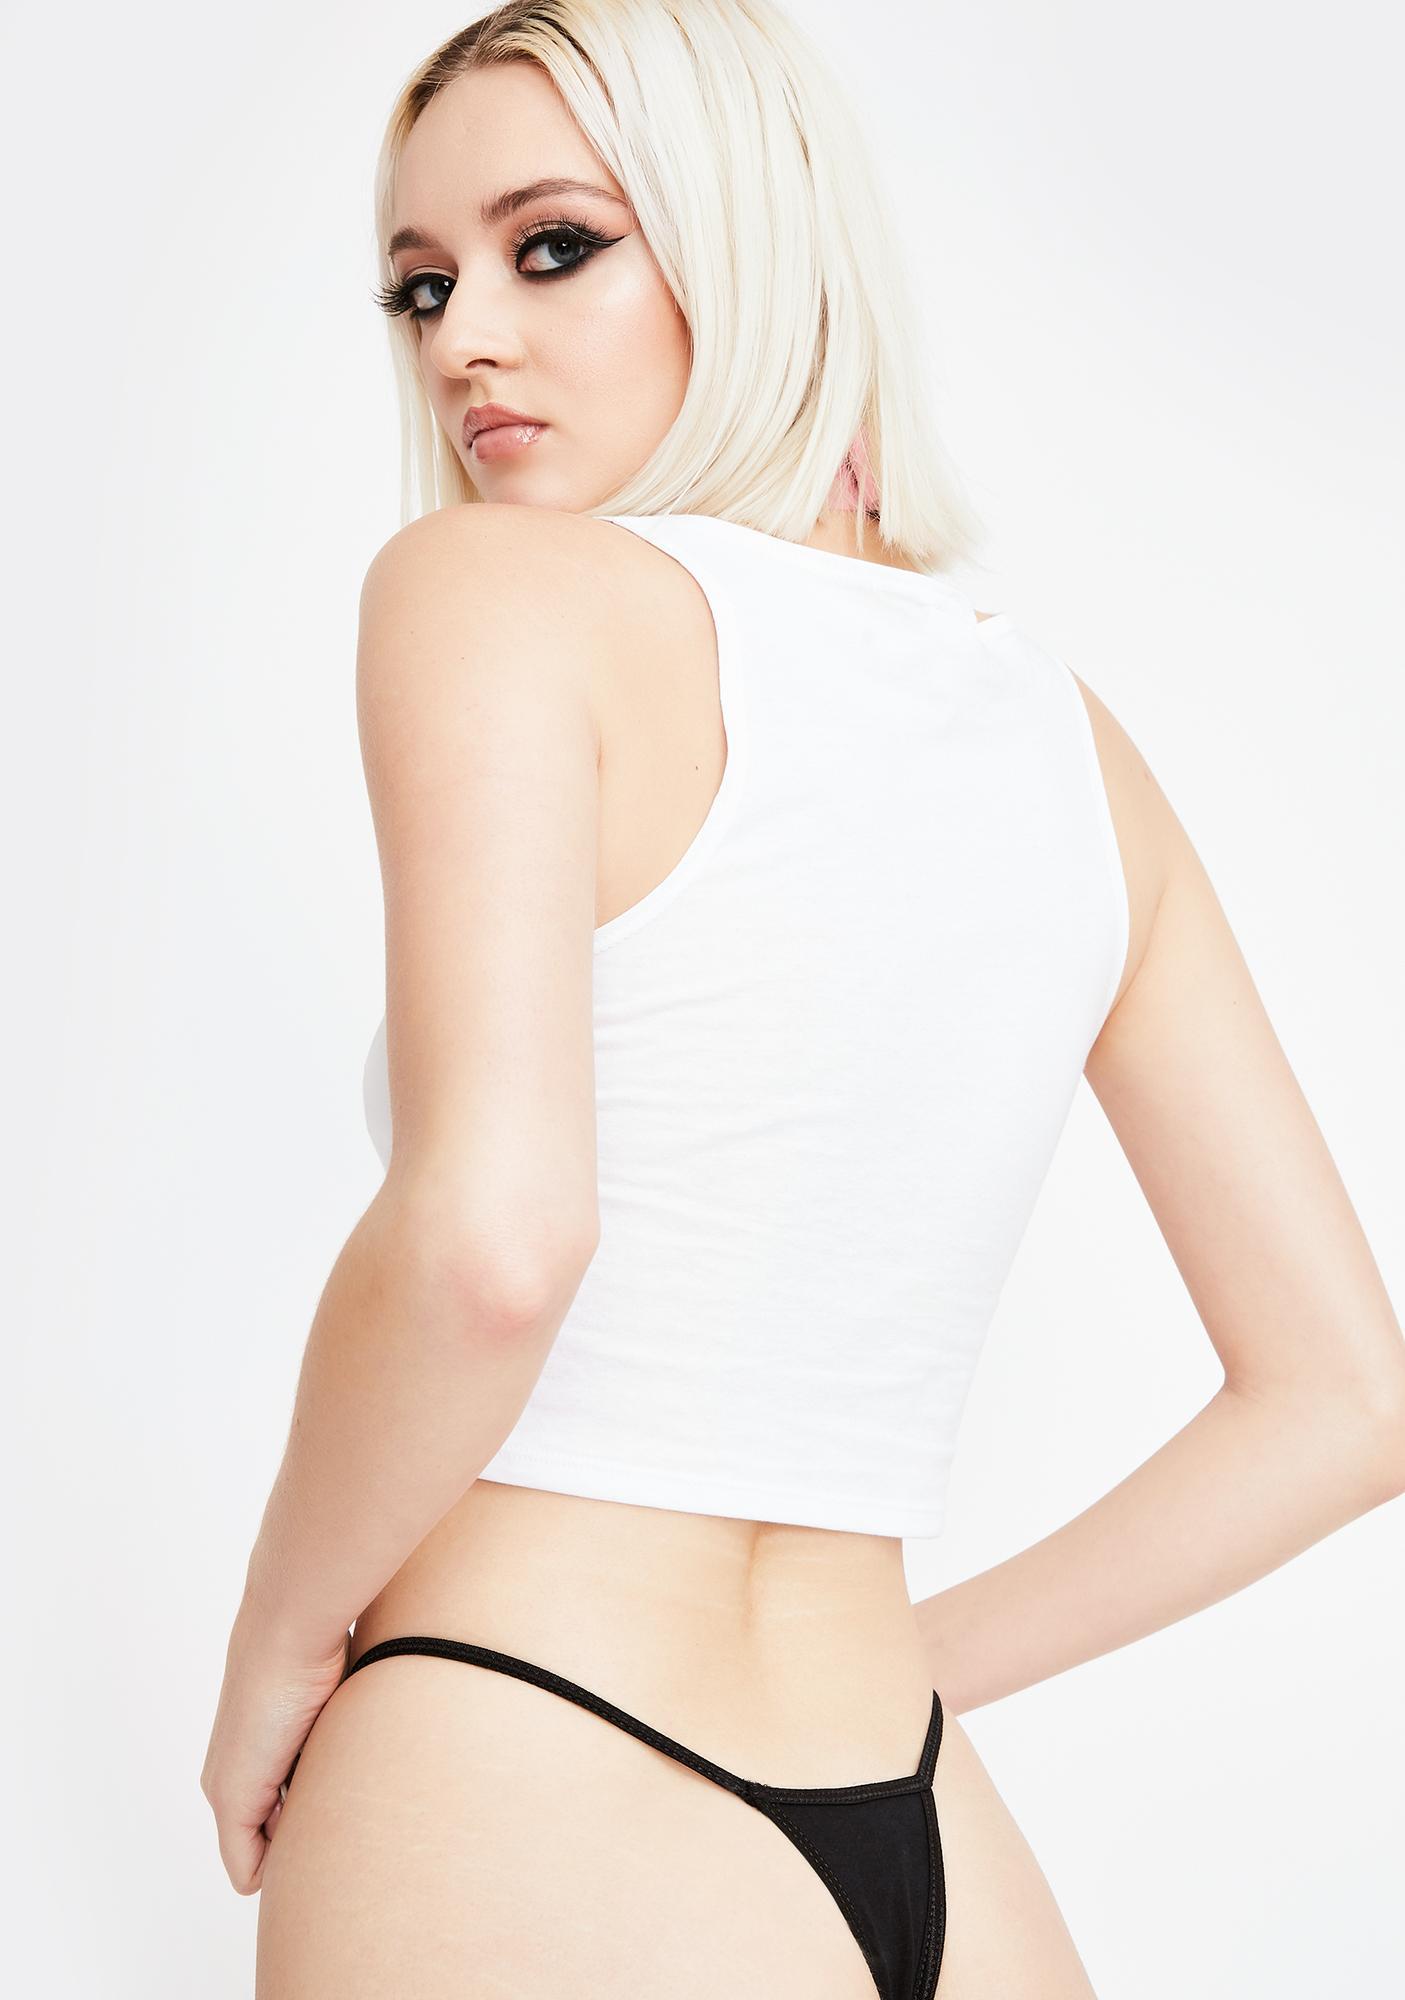 Geneva Diva That Bitch Graphic Thong